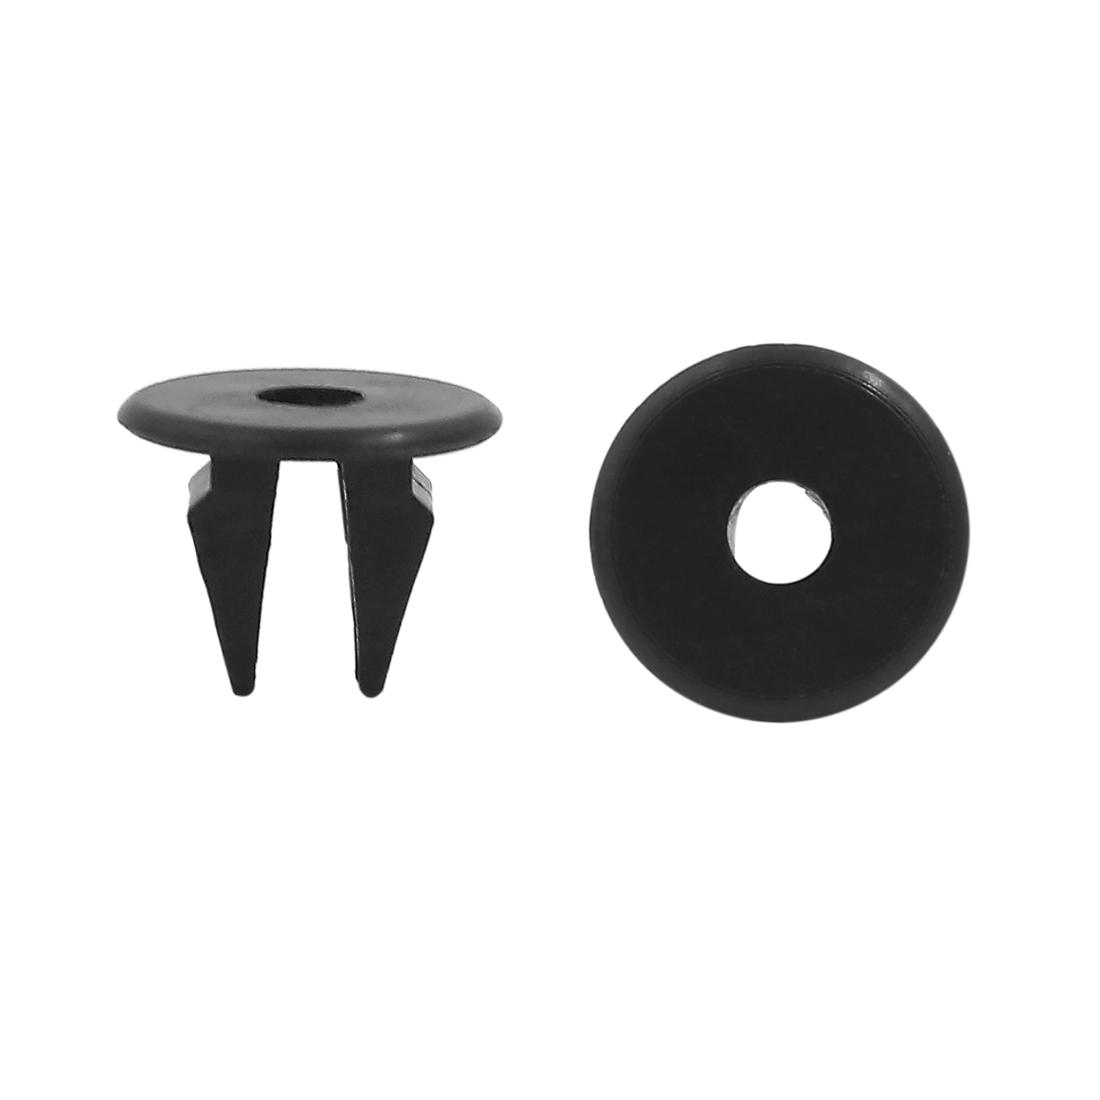 50 Pcs Black Plastic Push Type Fasteners Clip Car Auto Rivet 10 x 8mm Hole Diat